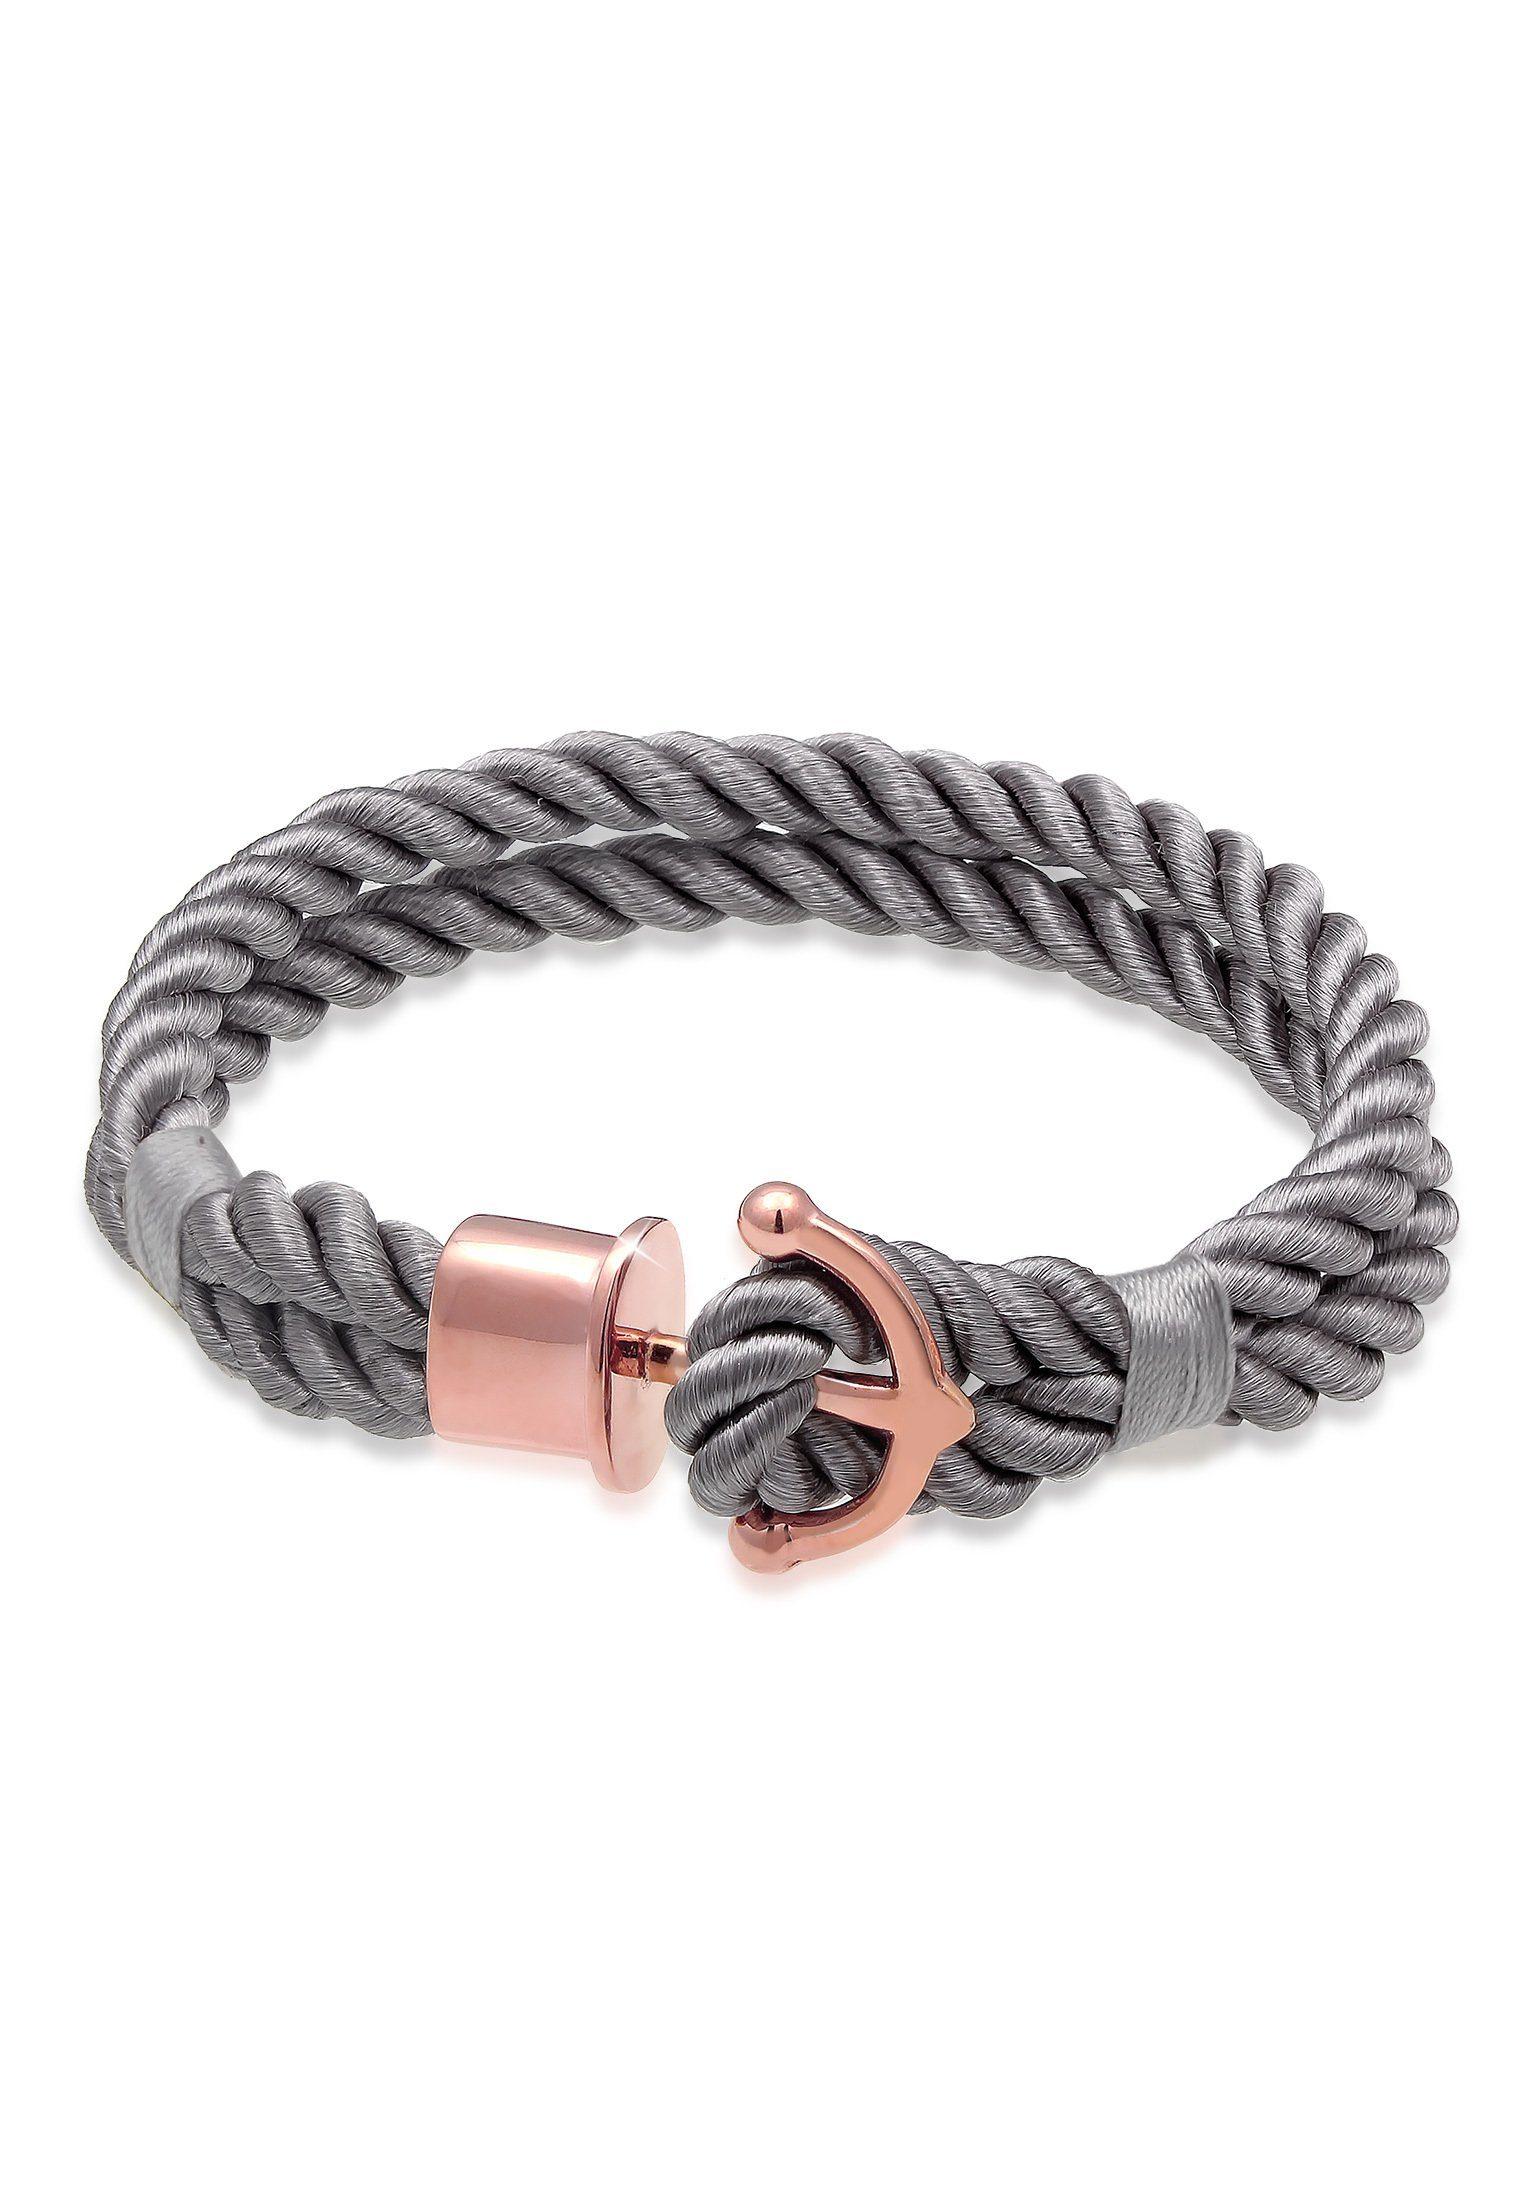 Nenalina Armband Anker Maritim Nylon Bändchen 925er Silber rosé | Schmuck > Armbänder > Silberarmbänder | Nenalina